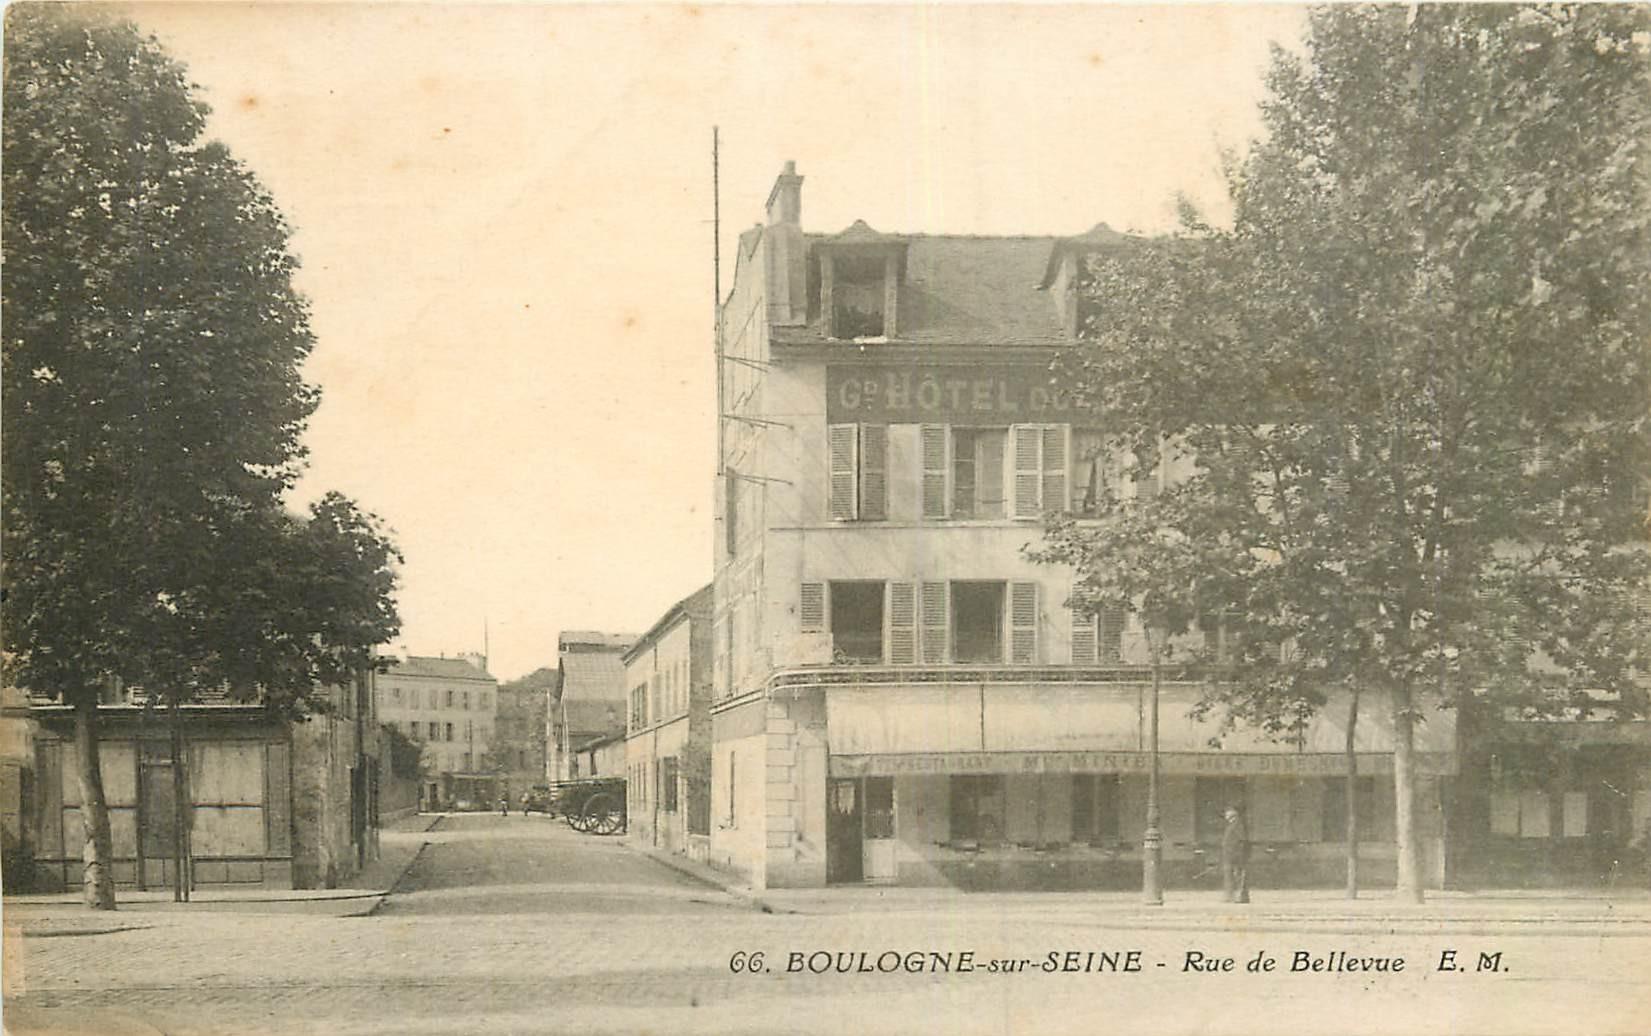 WW 92 BOULOGNE-SUR-SEINE. Hôtel Restaurant Minier rue de Bellevue